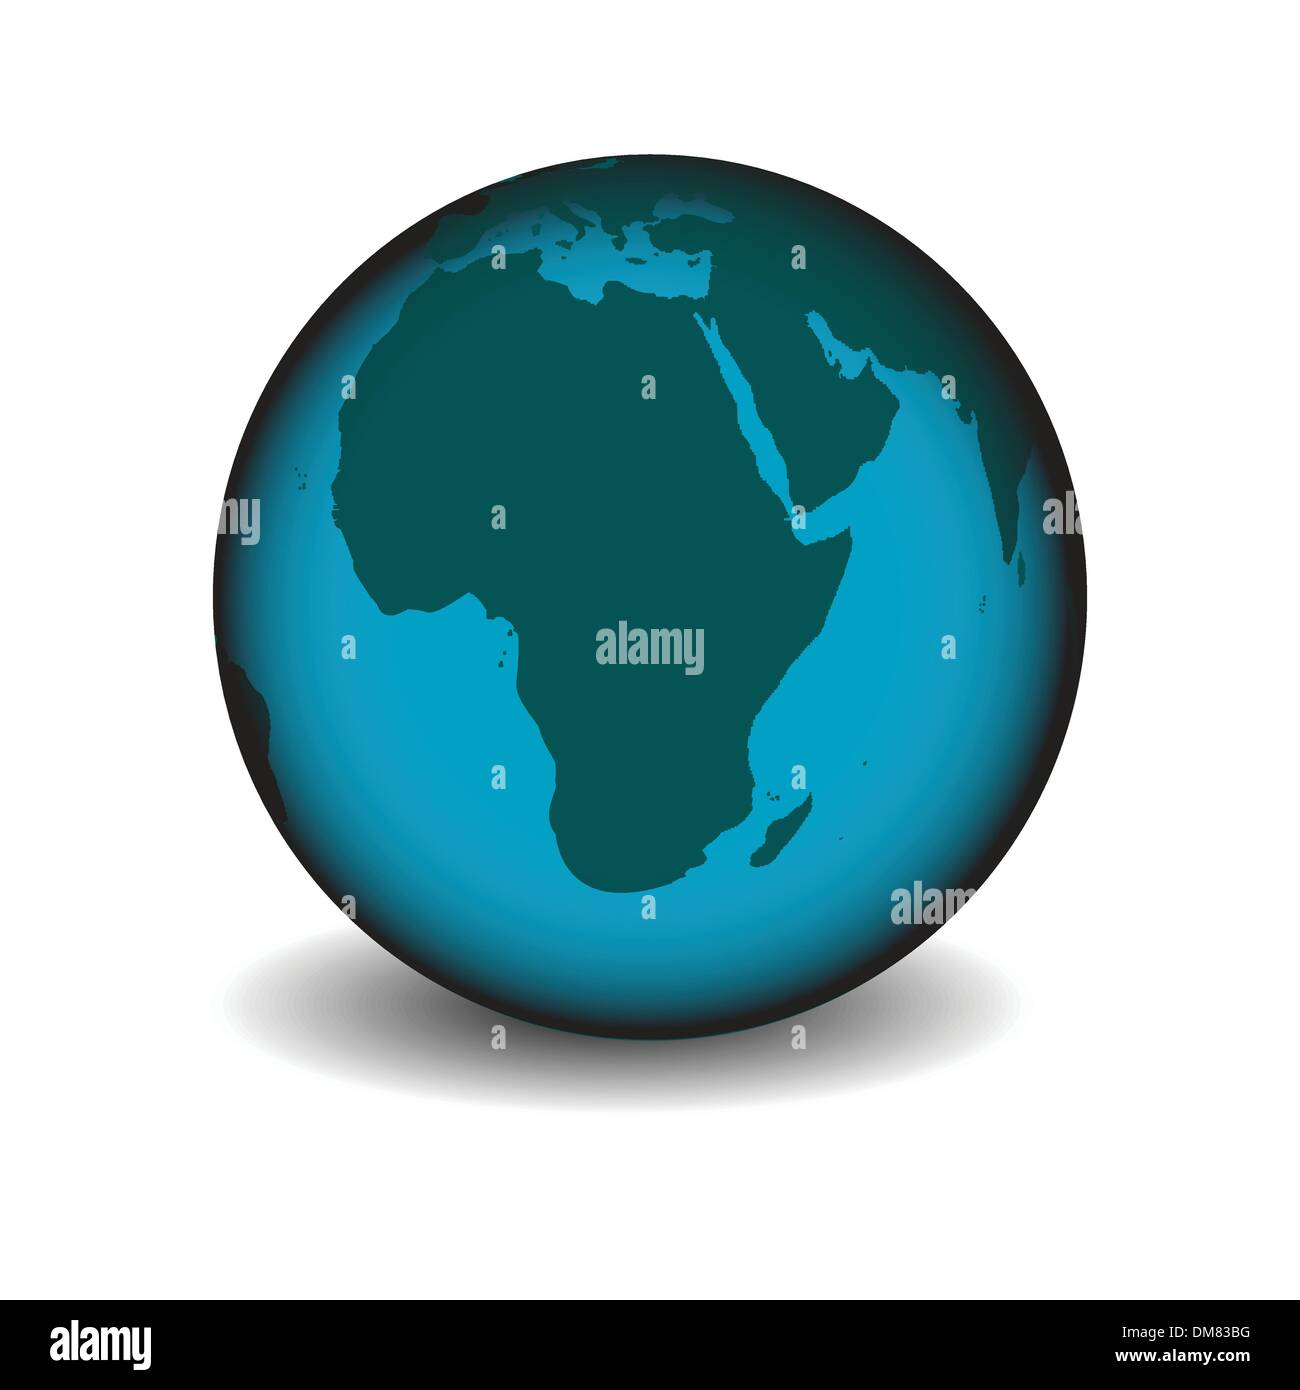 earth globe - Stock Image